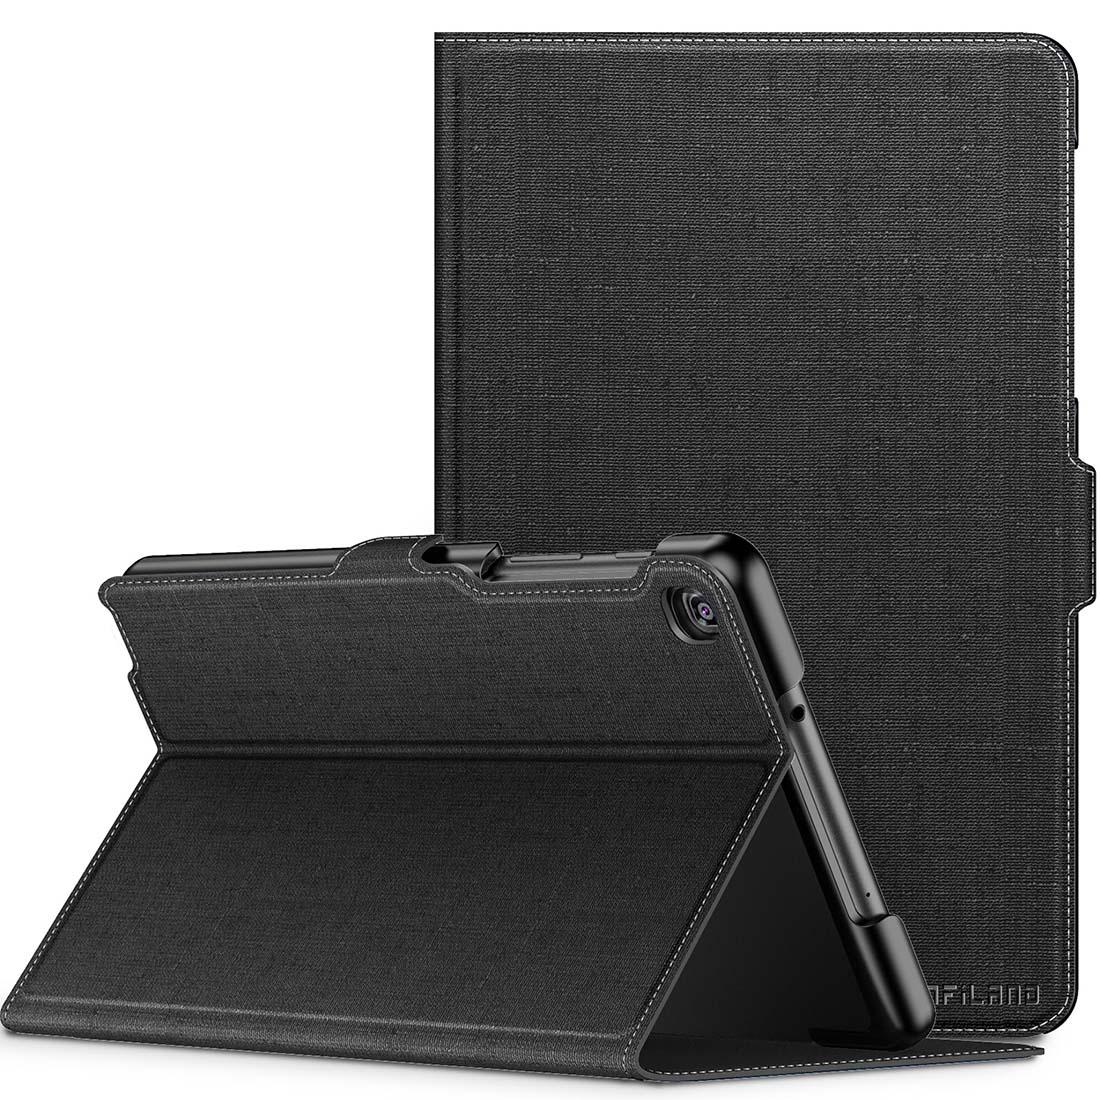 Capa Premium Classic Series Fino Acabamento Samsung Galaxy Tab A 8.0 pol 2019 P200 P205